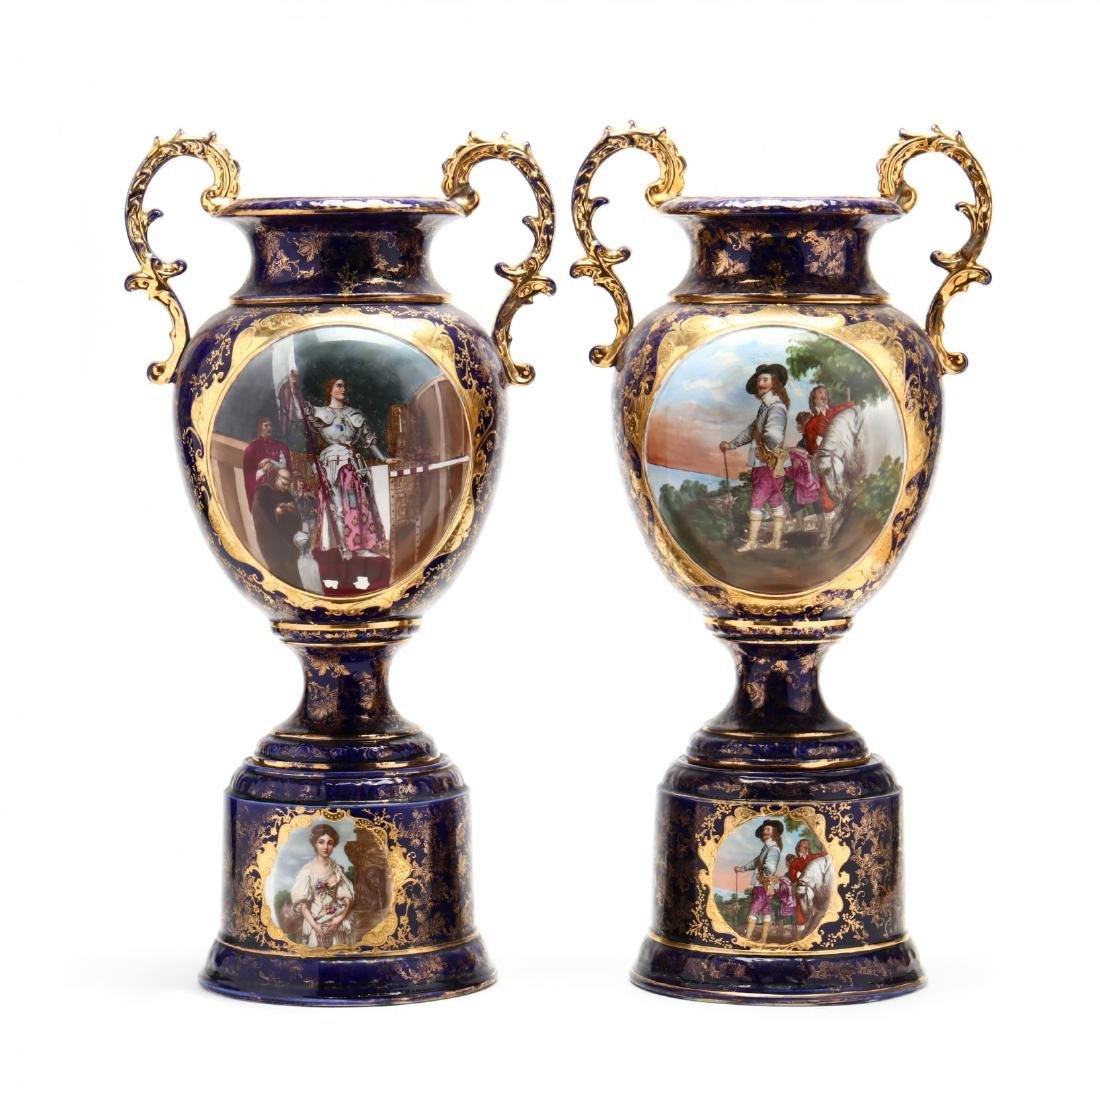 Pair of Antique English Porcelain Mantel Urns